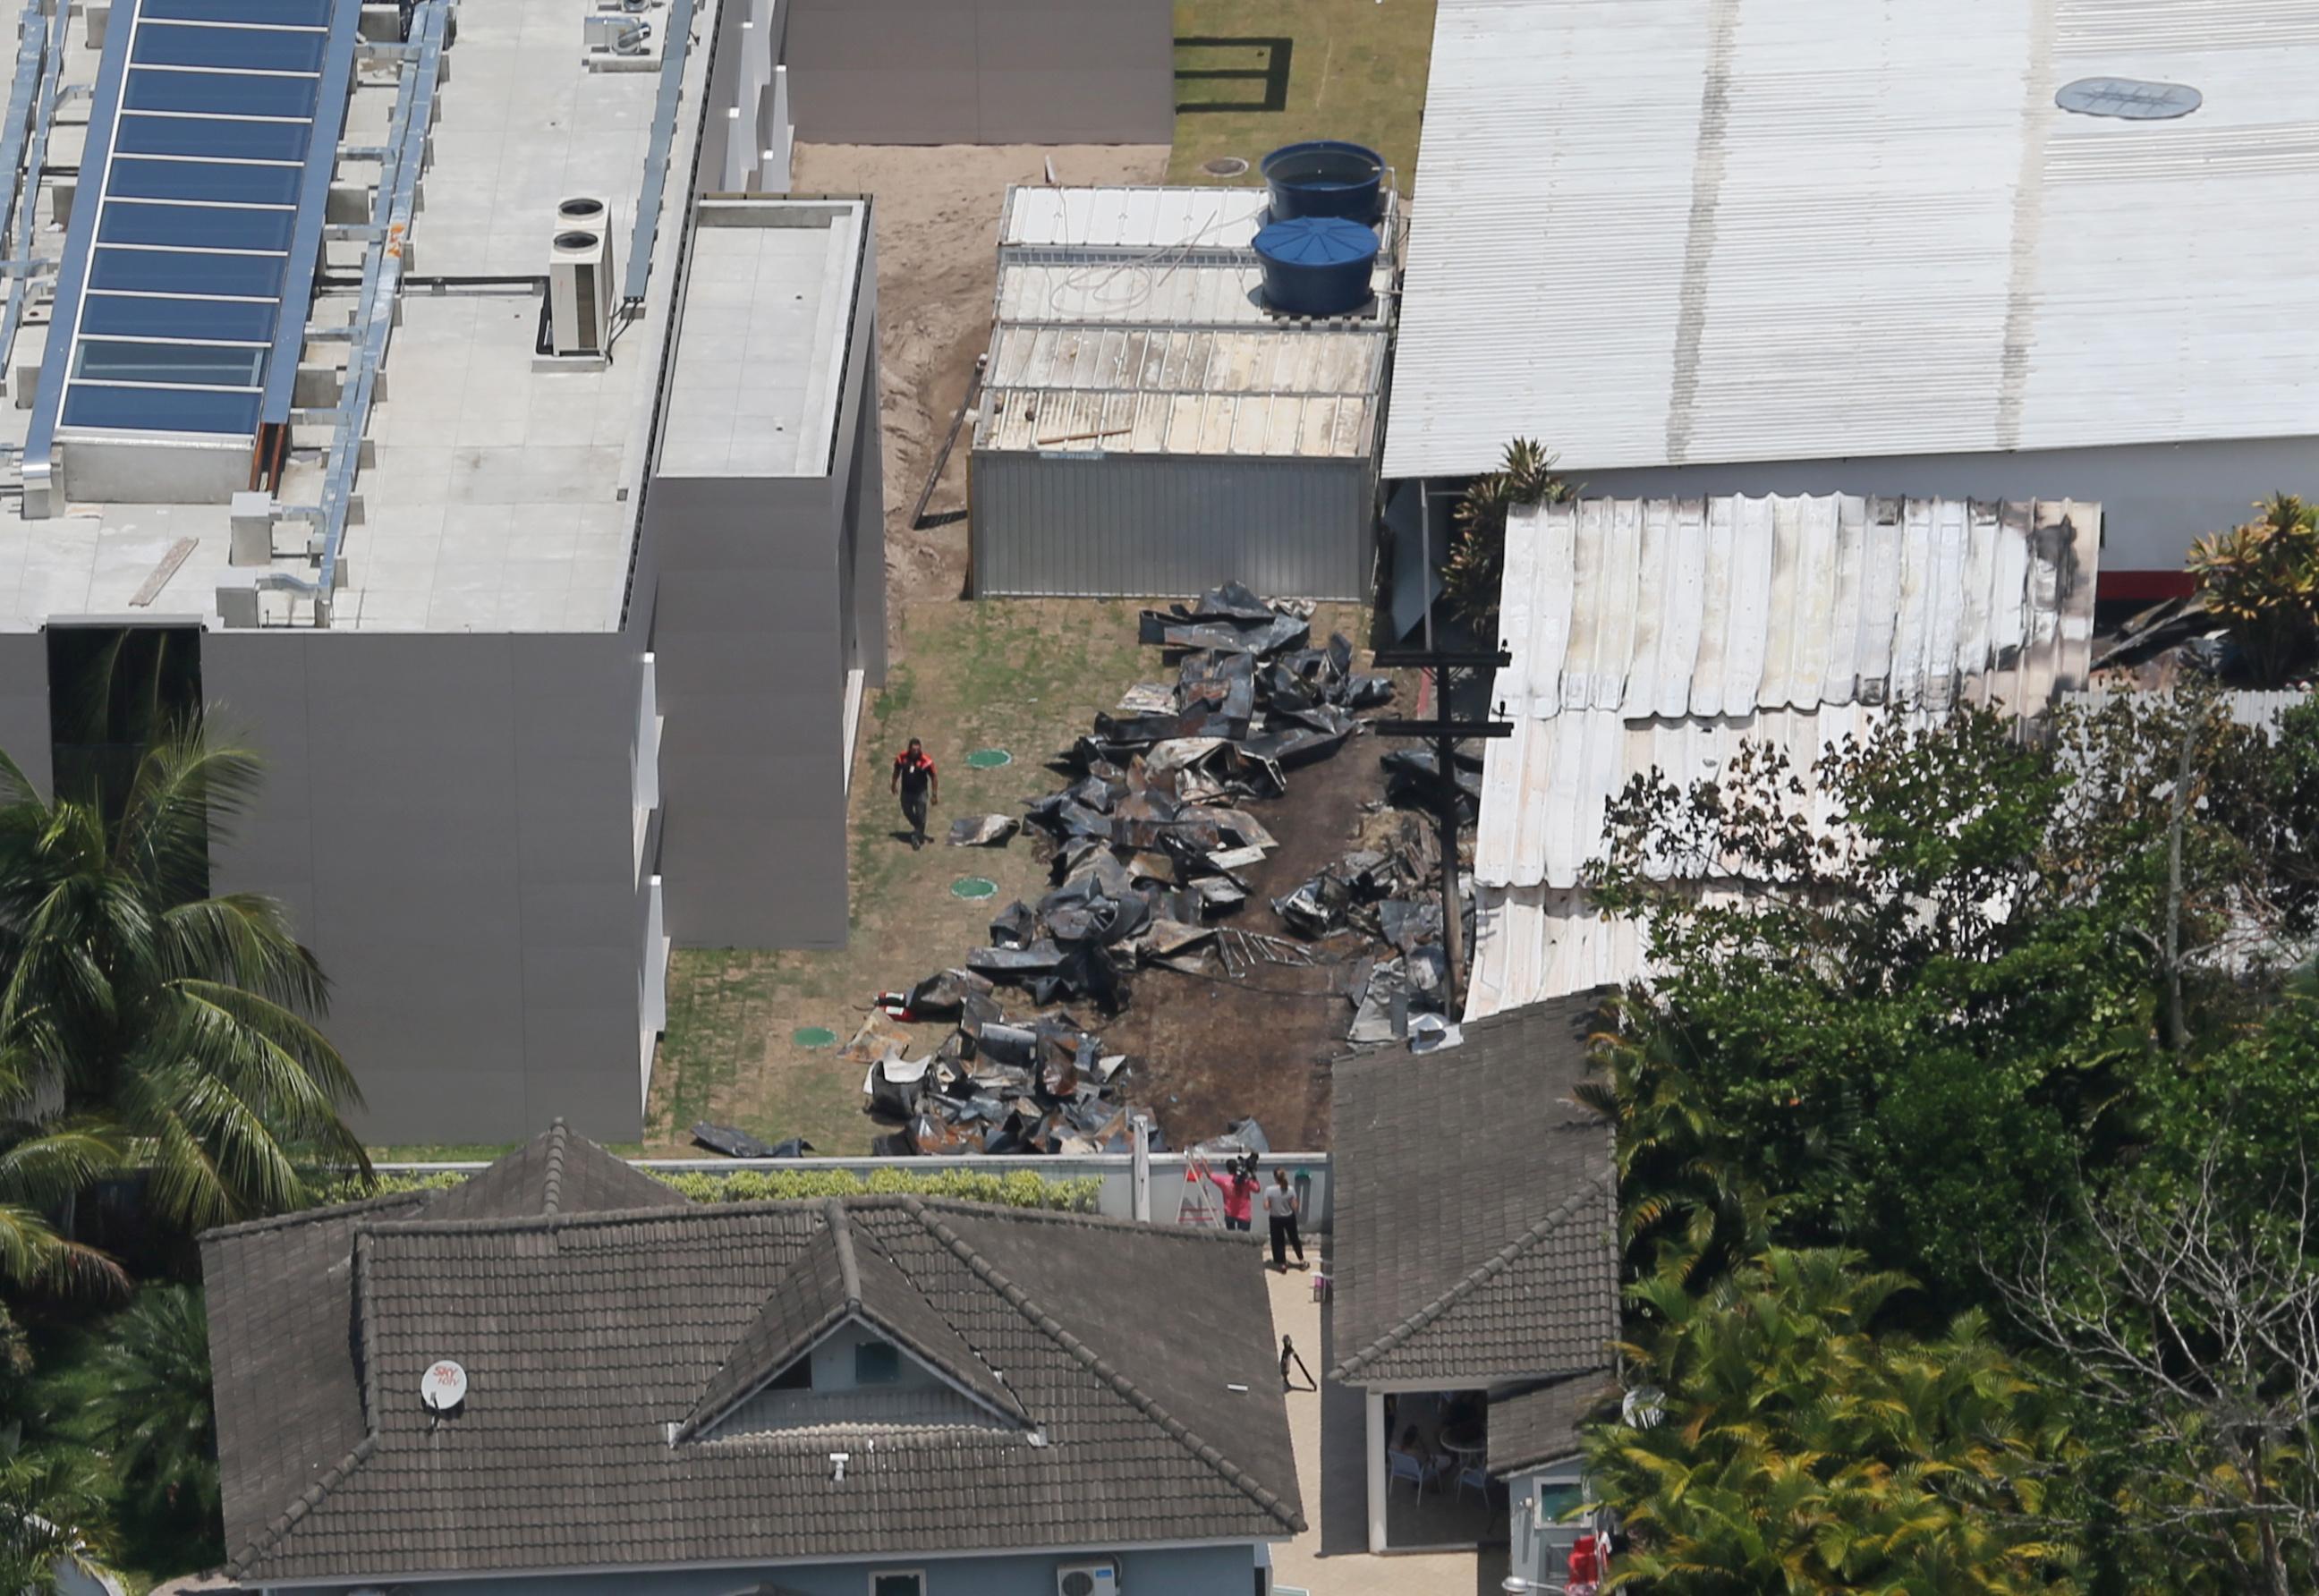 Ten Killed As Fire Sweeps Through Flamengo Training Center In Rio